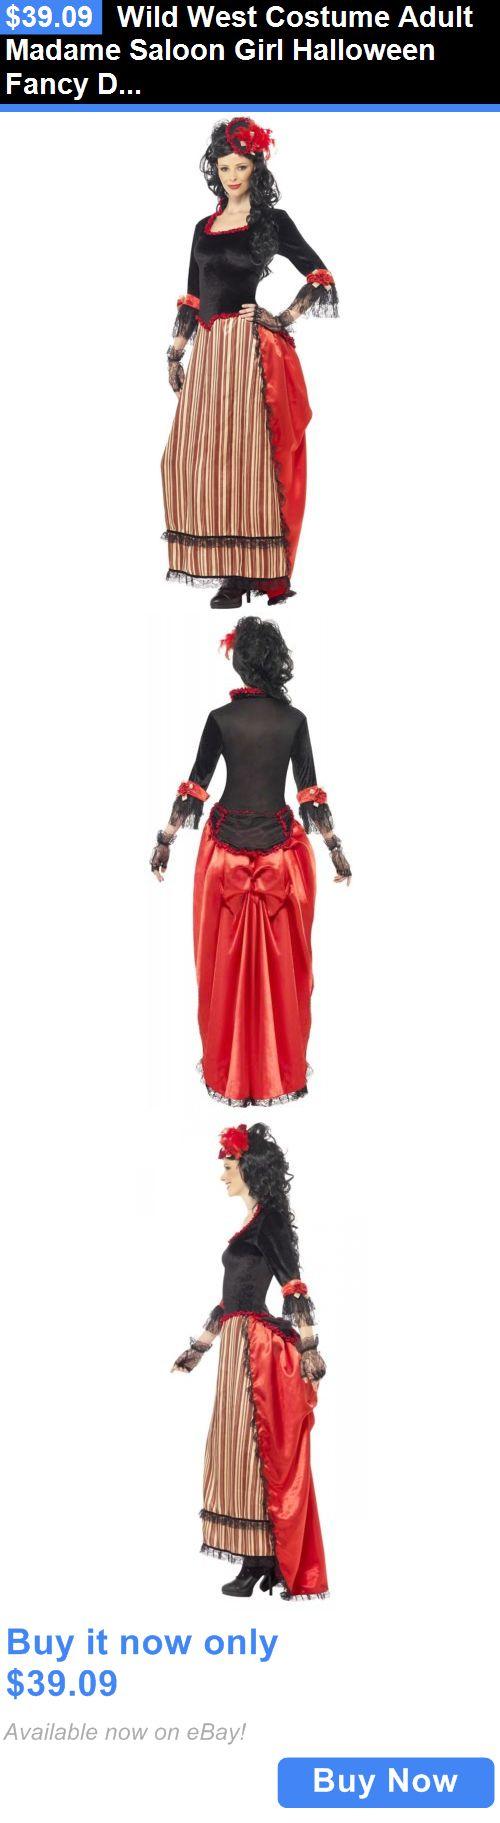 Halloween Costumes Women: Wild West Costume Adult Madame Saloon Girl Halloween Fancy Dress BUY IT NOW ONLY: $39.09